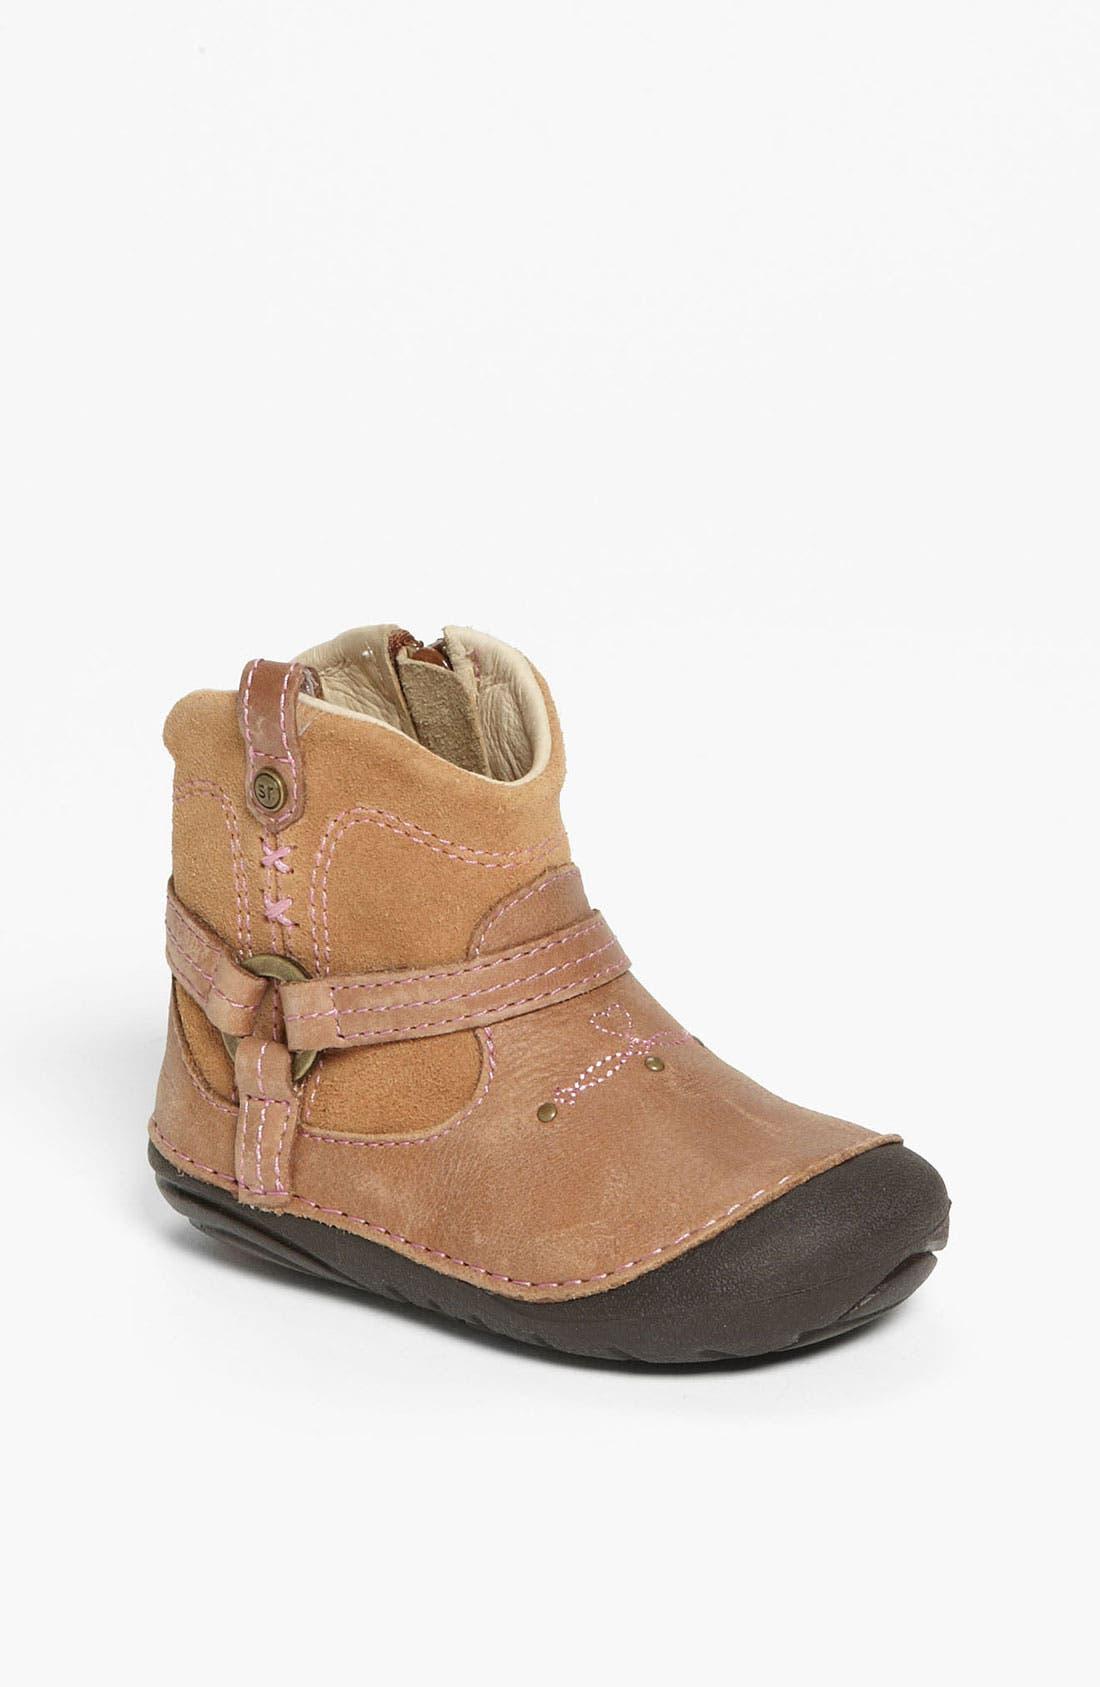 Main Image - Stride Rite 'Heather' Boot (Baby & Walker)